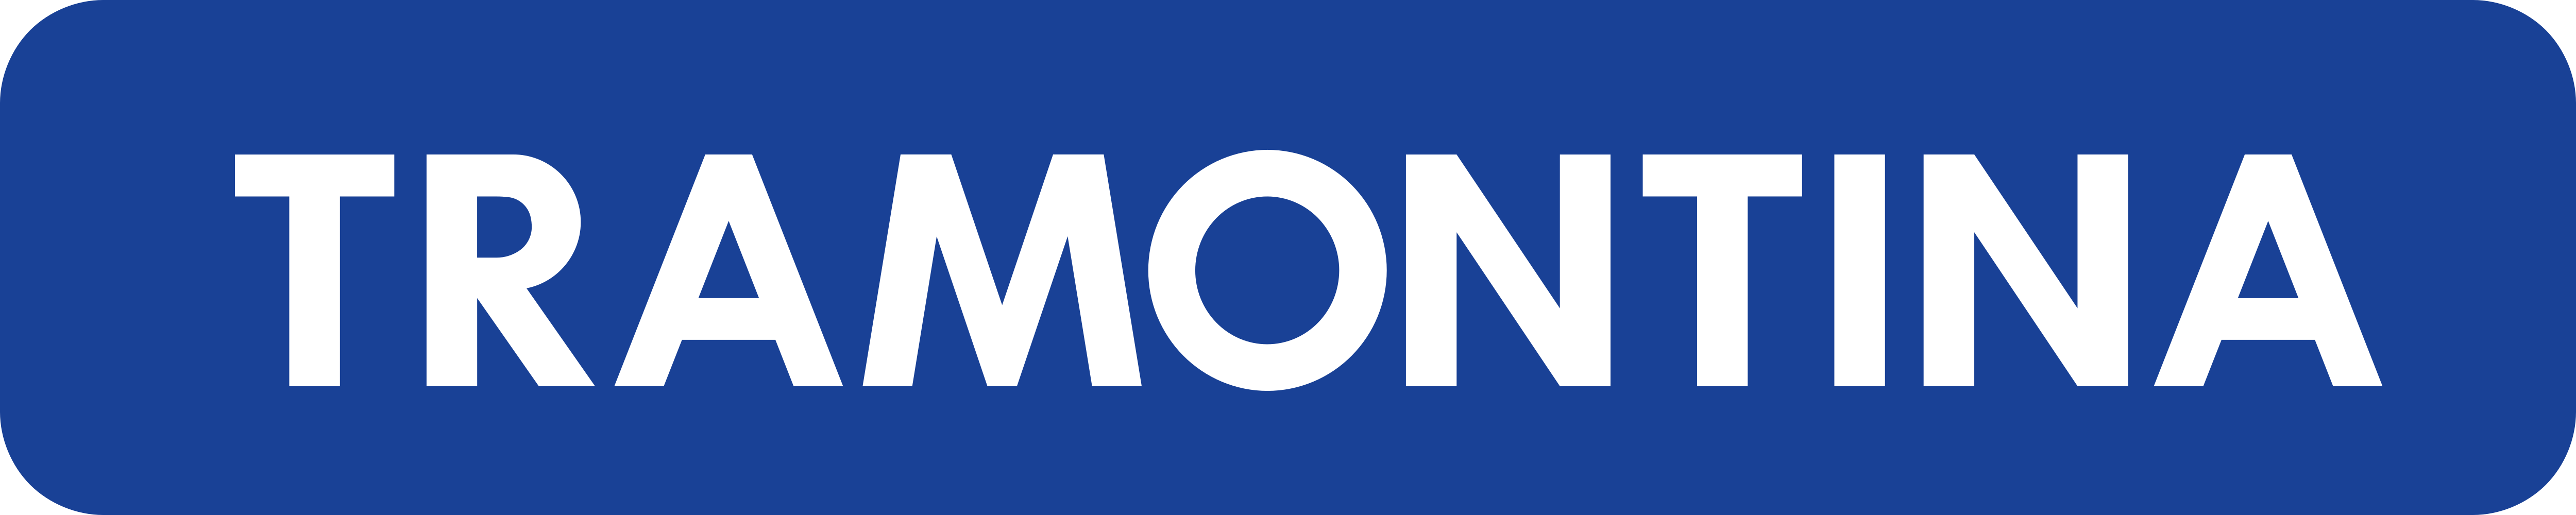 Tramontina, Inc.